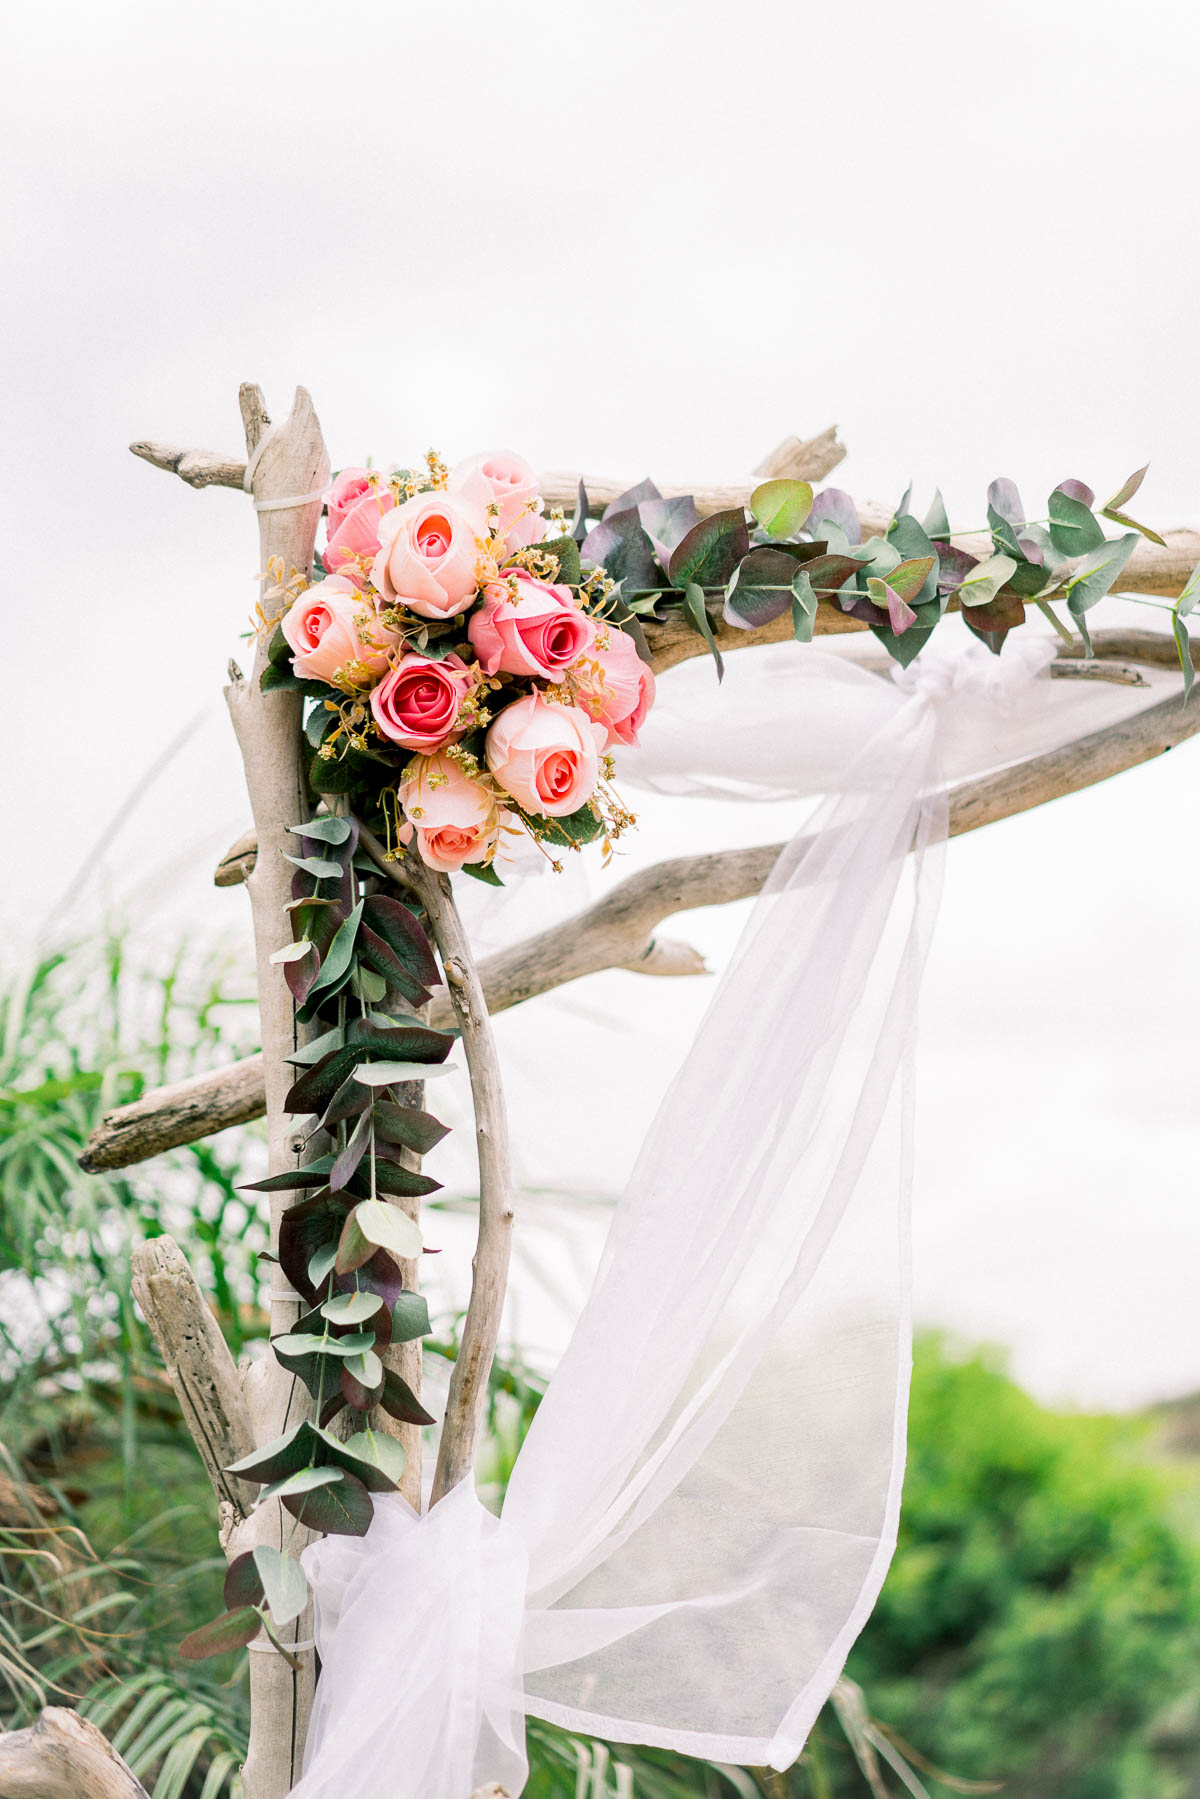 mt-eliza-mornington-peninsula-backyard-wedding-heart+soul-weddings-allison-matt-02930.jpg